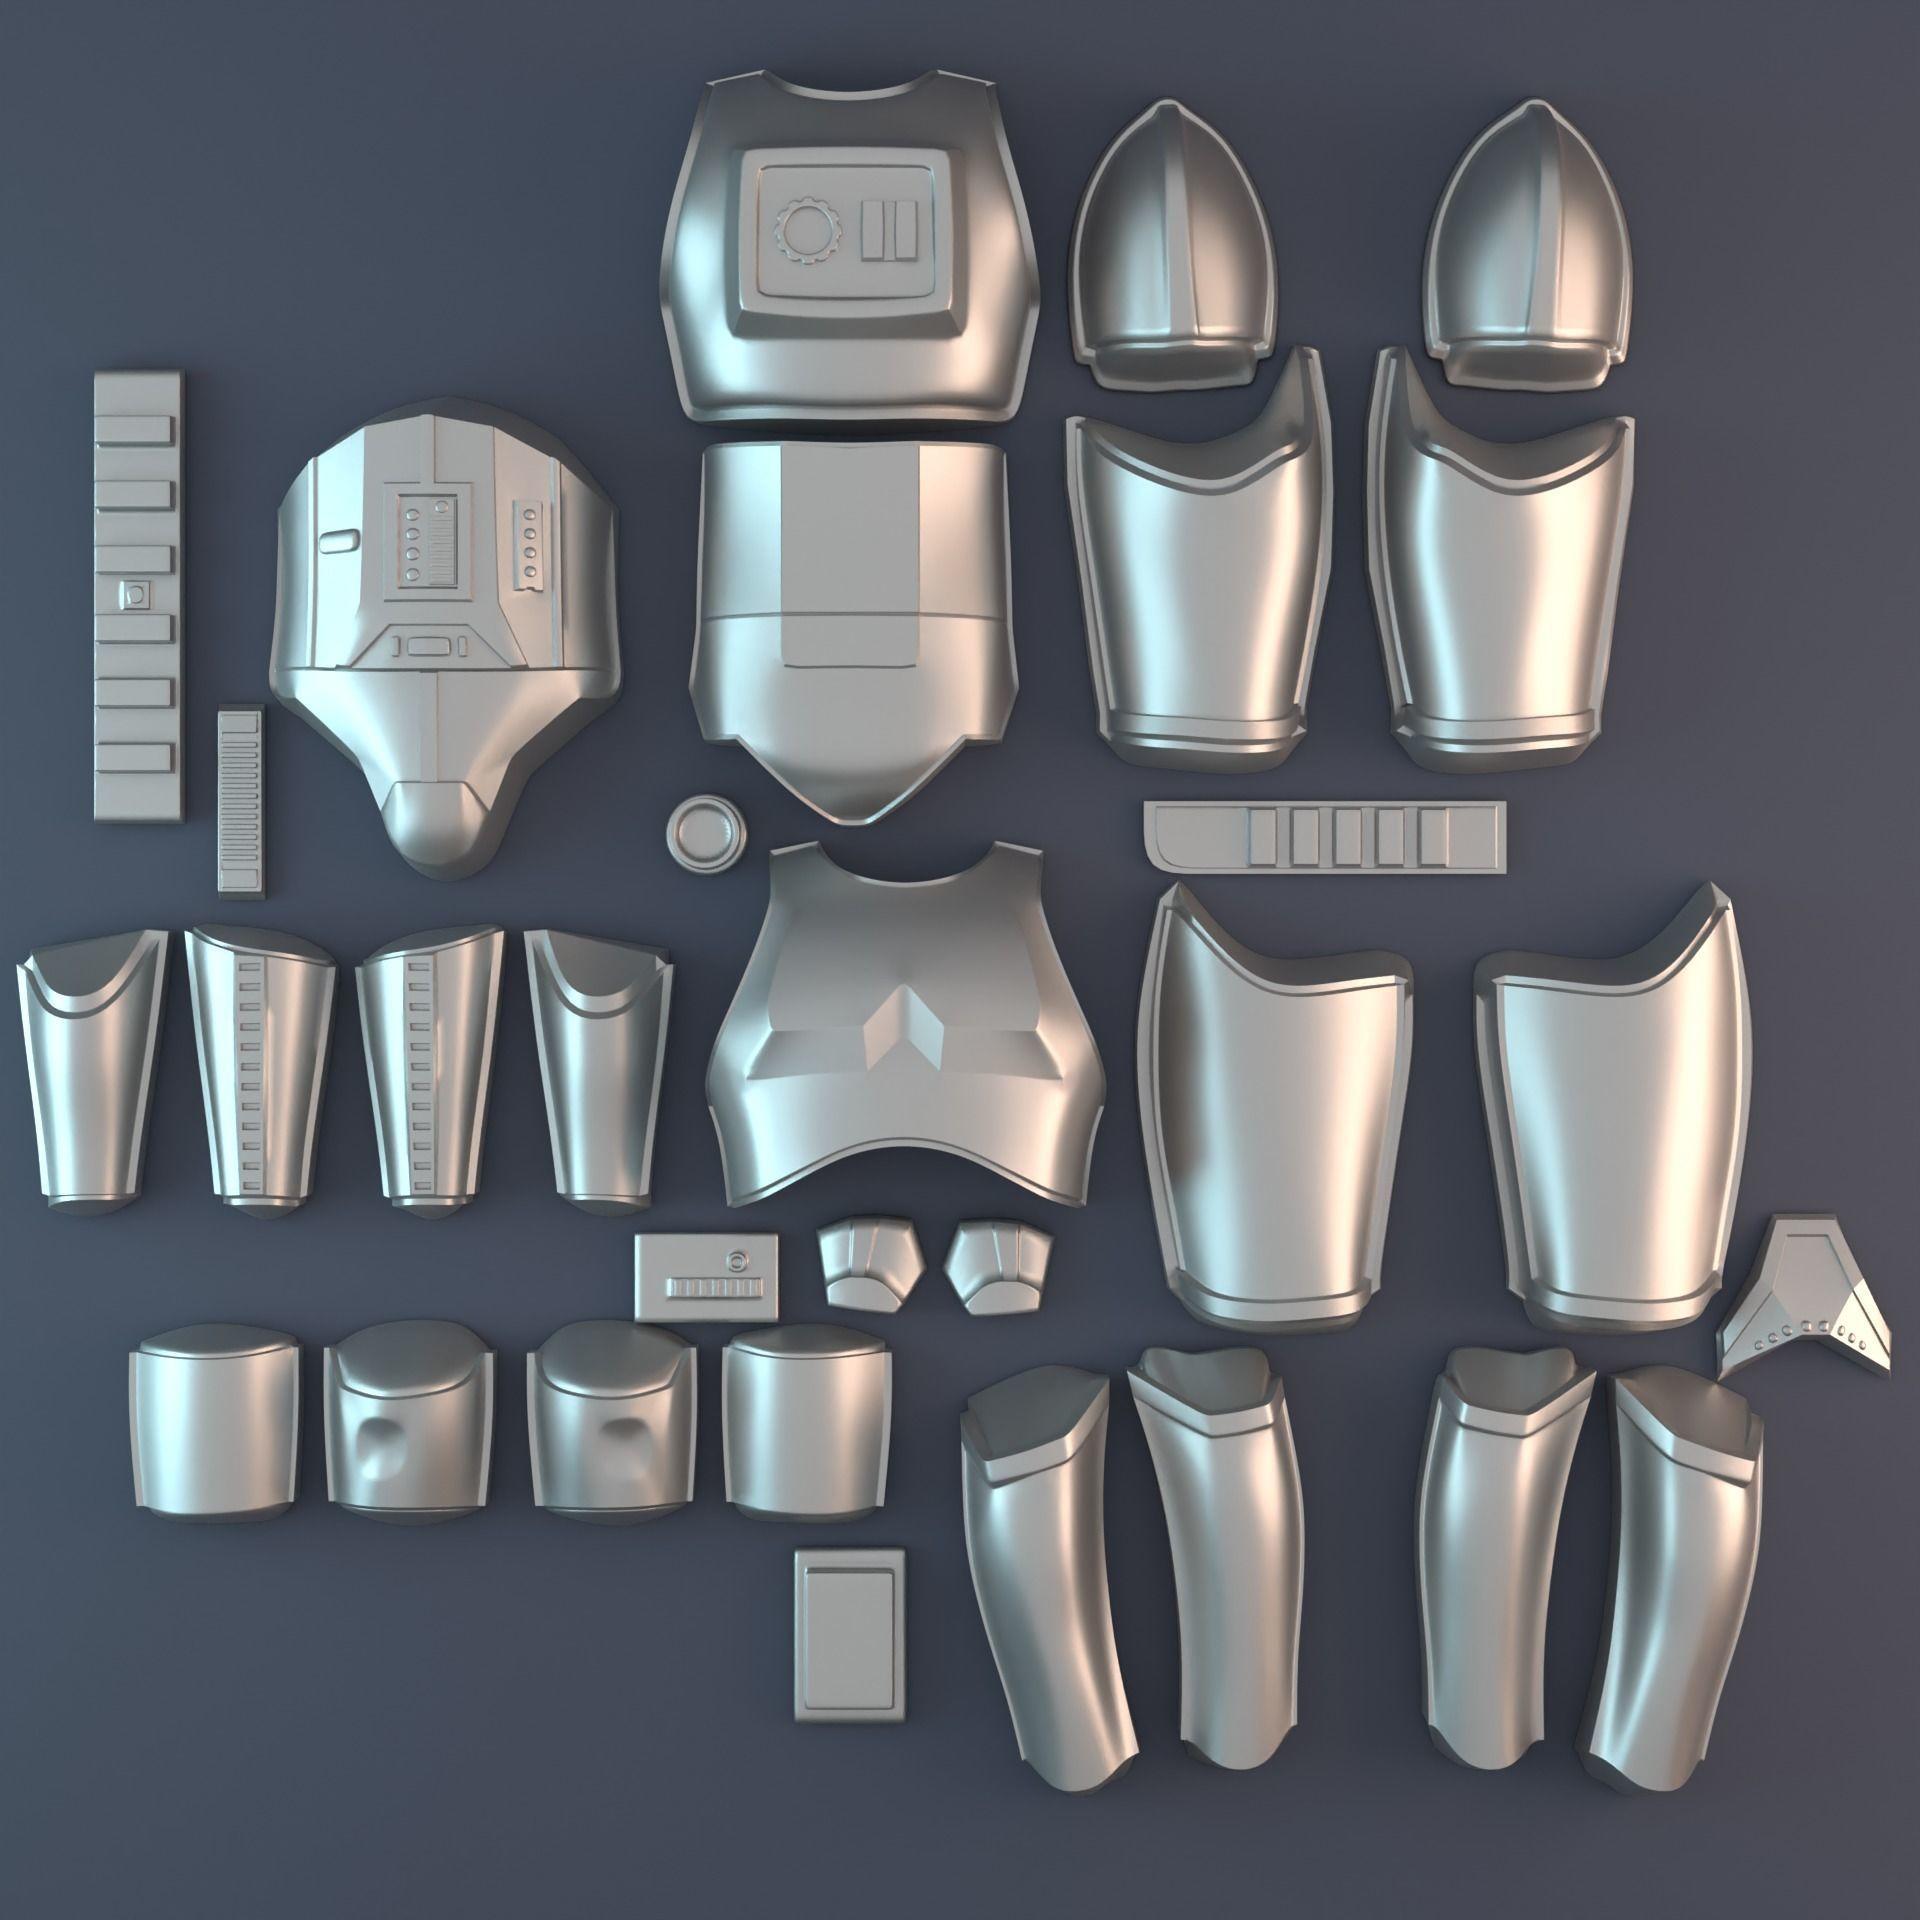 OT Stormtrooper armor vacuum form bucks